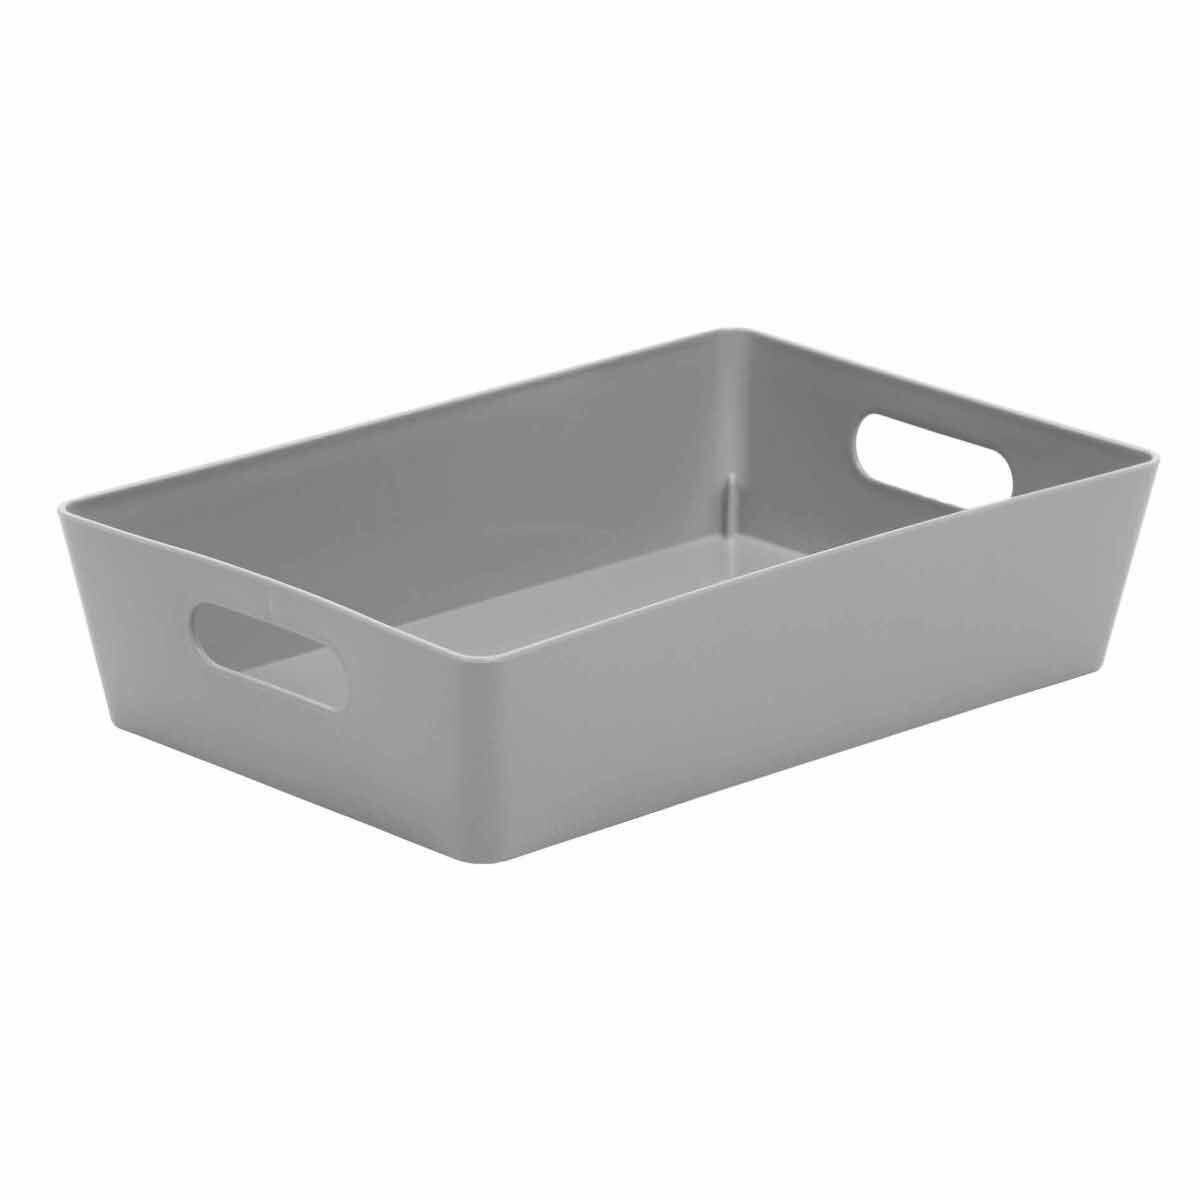 Wham Studio Rectangular Basket 4.01 Pack of 12 Grey